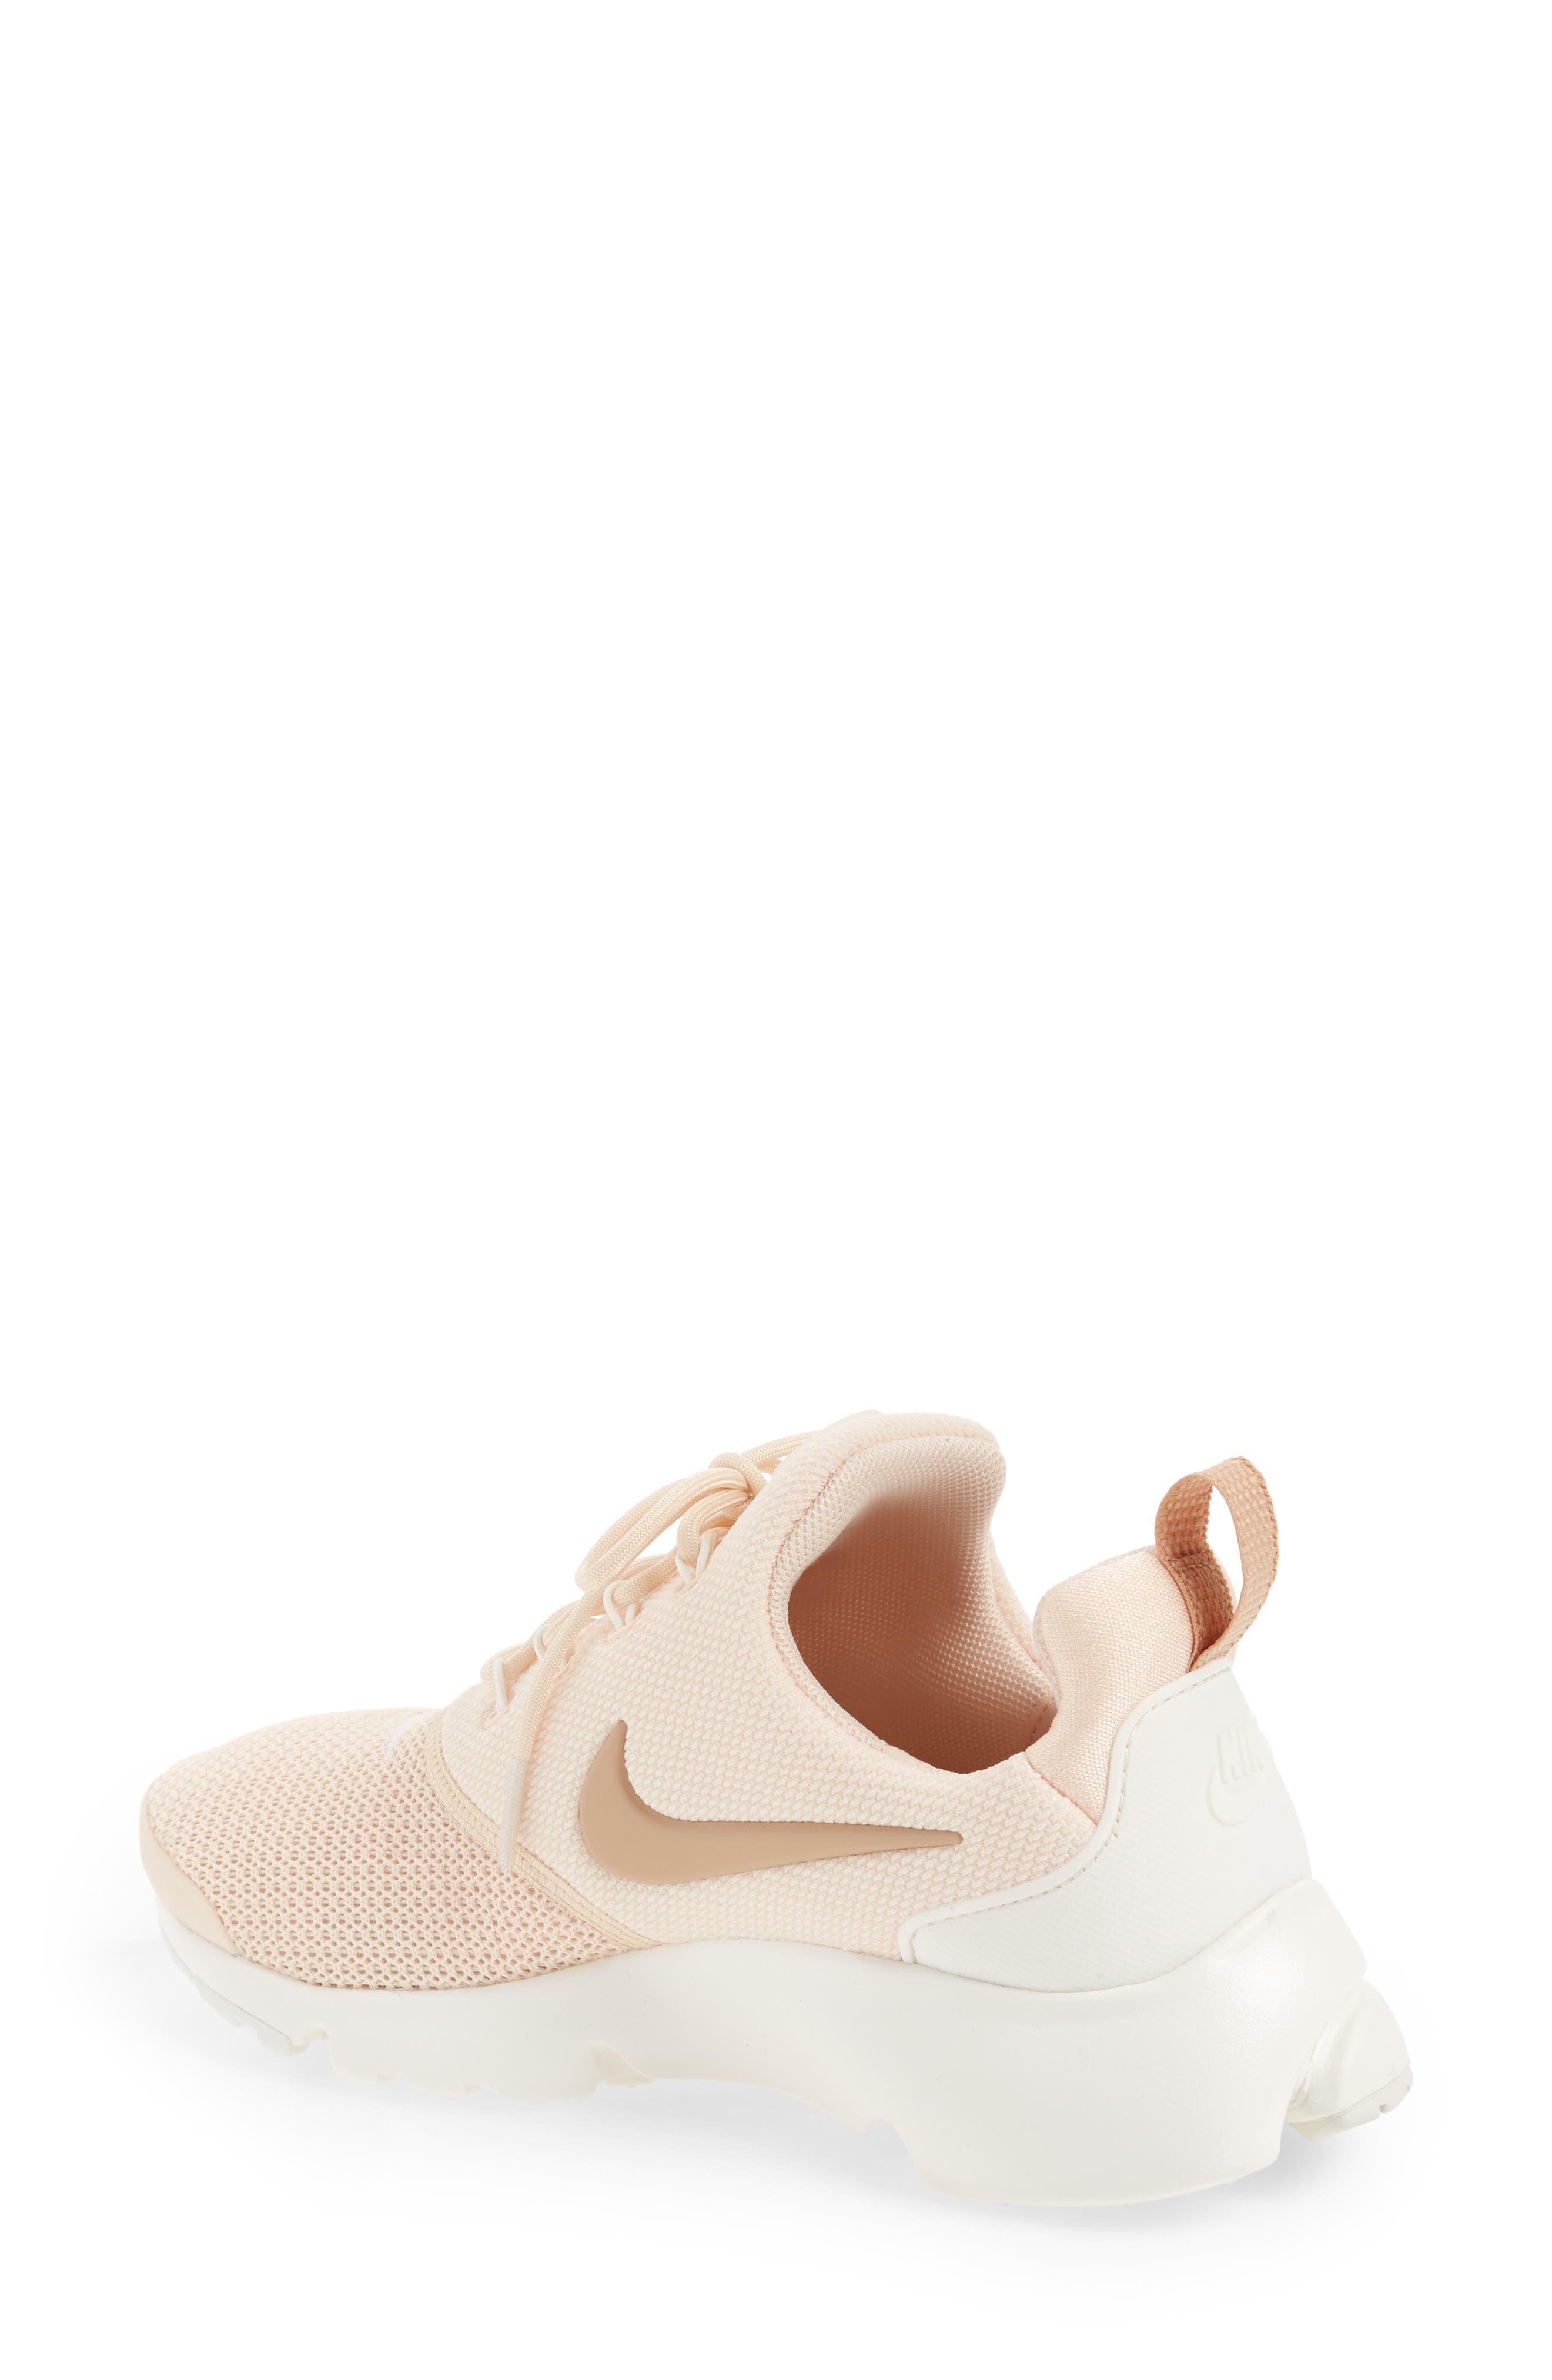 Presto Fly Sneaker,                             Alternate thumbnail 2, color,                             Guava Ice/ Beige/ Summit White